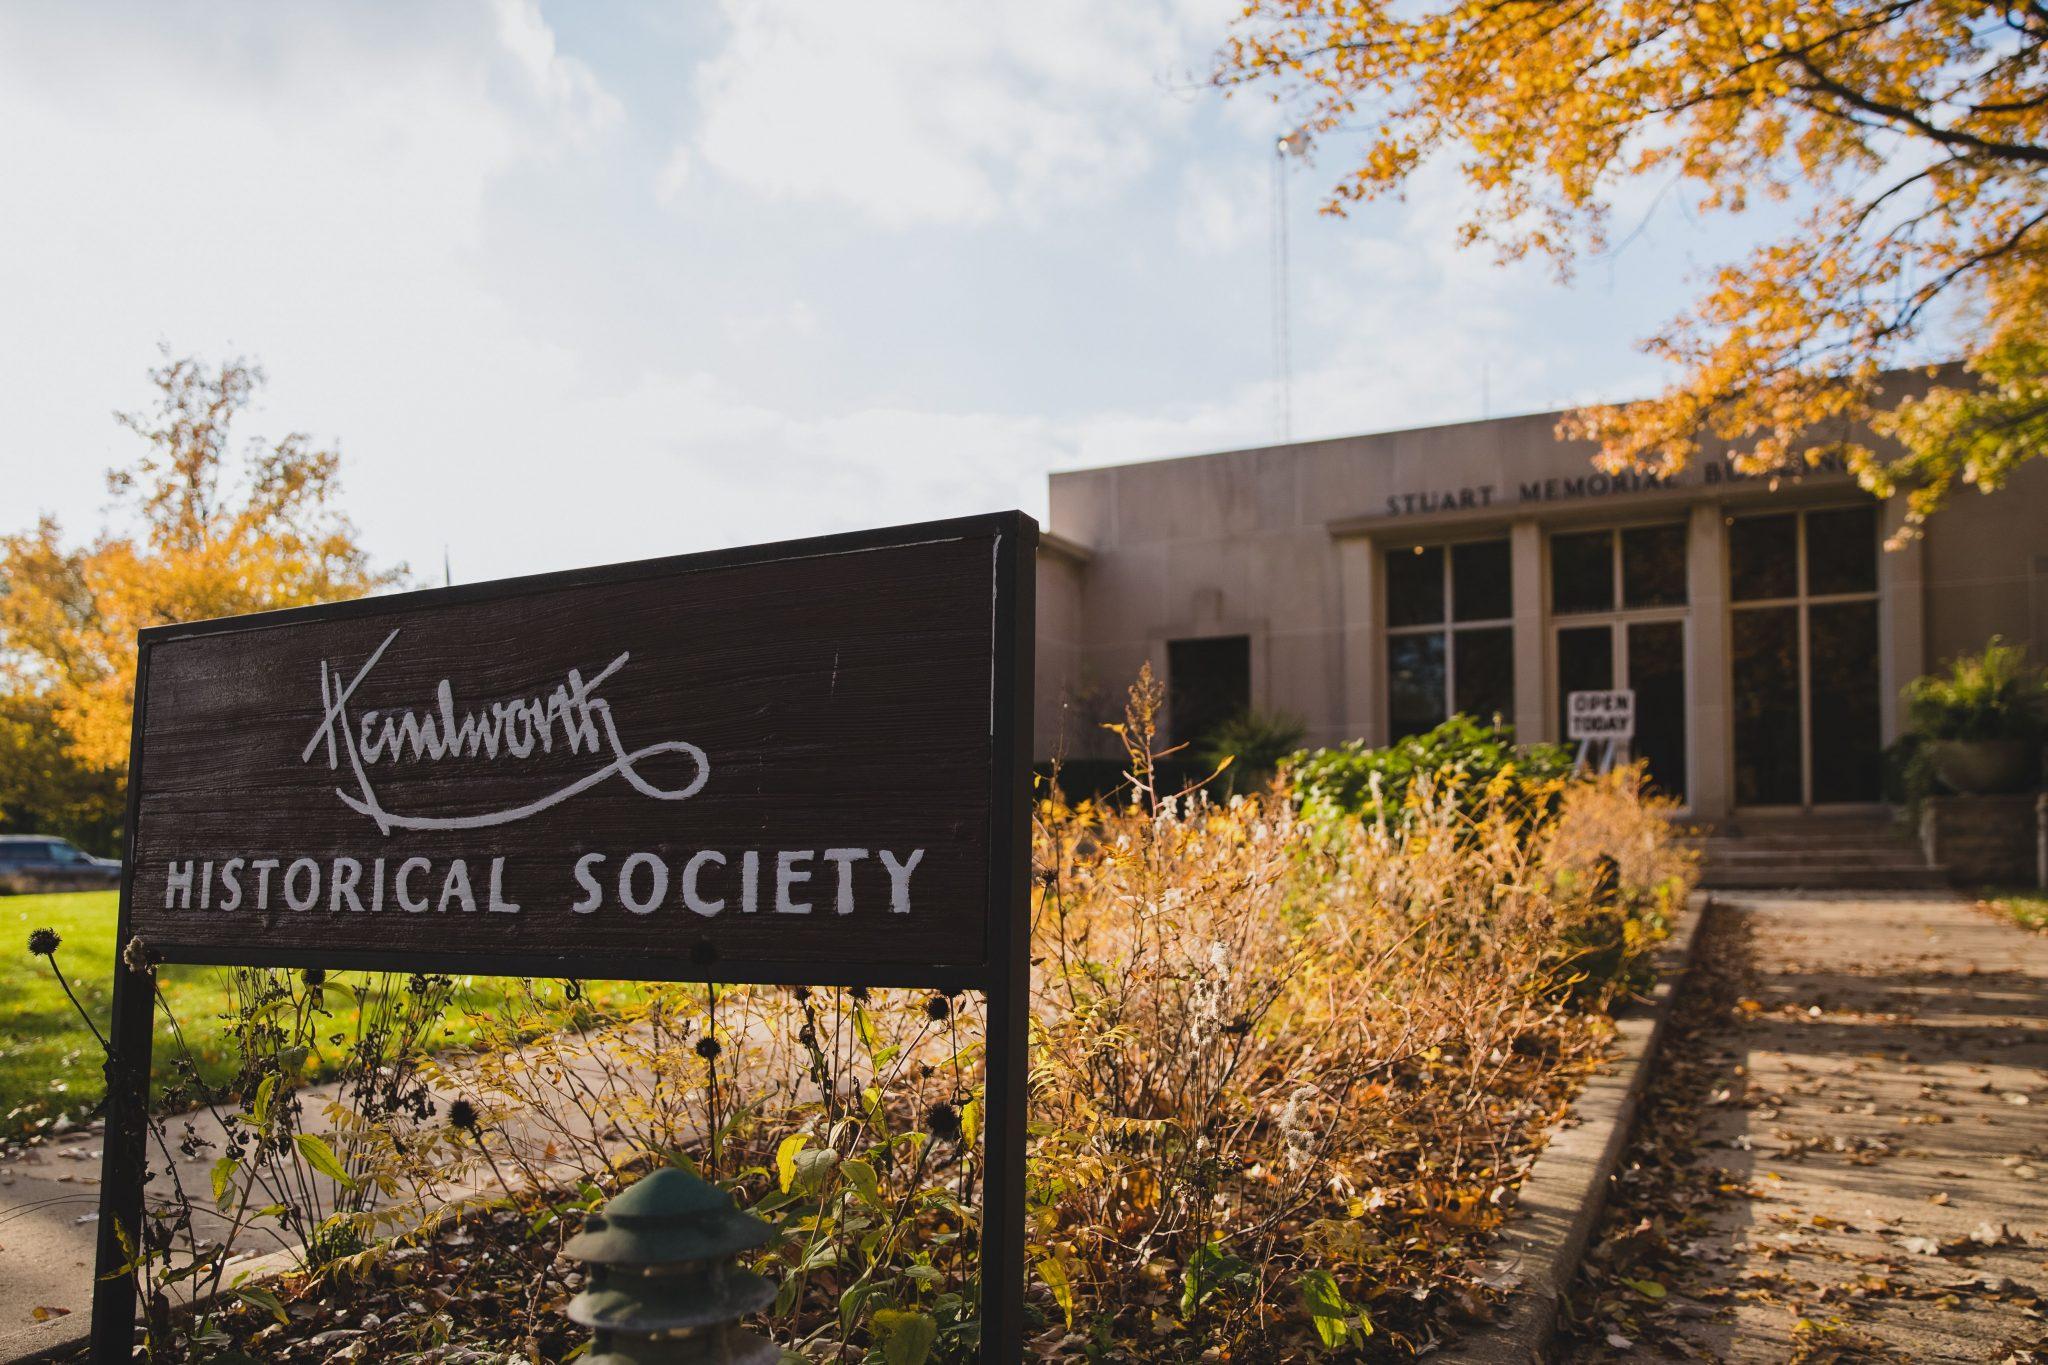 Kenilworth Historical Society